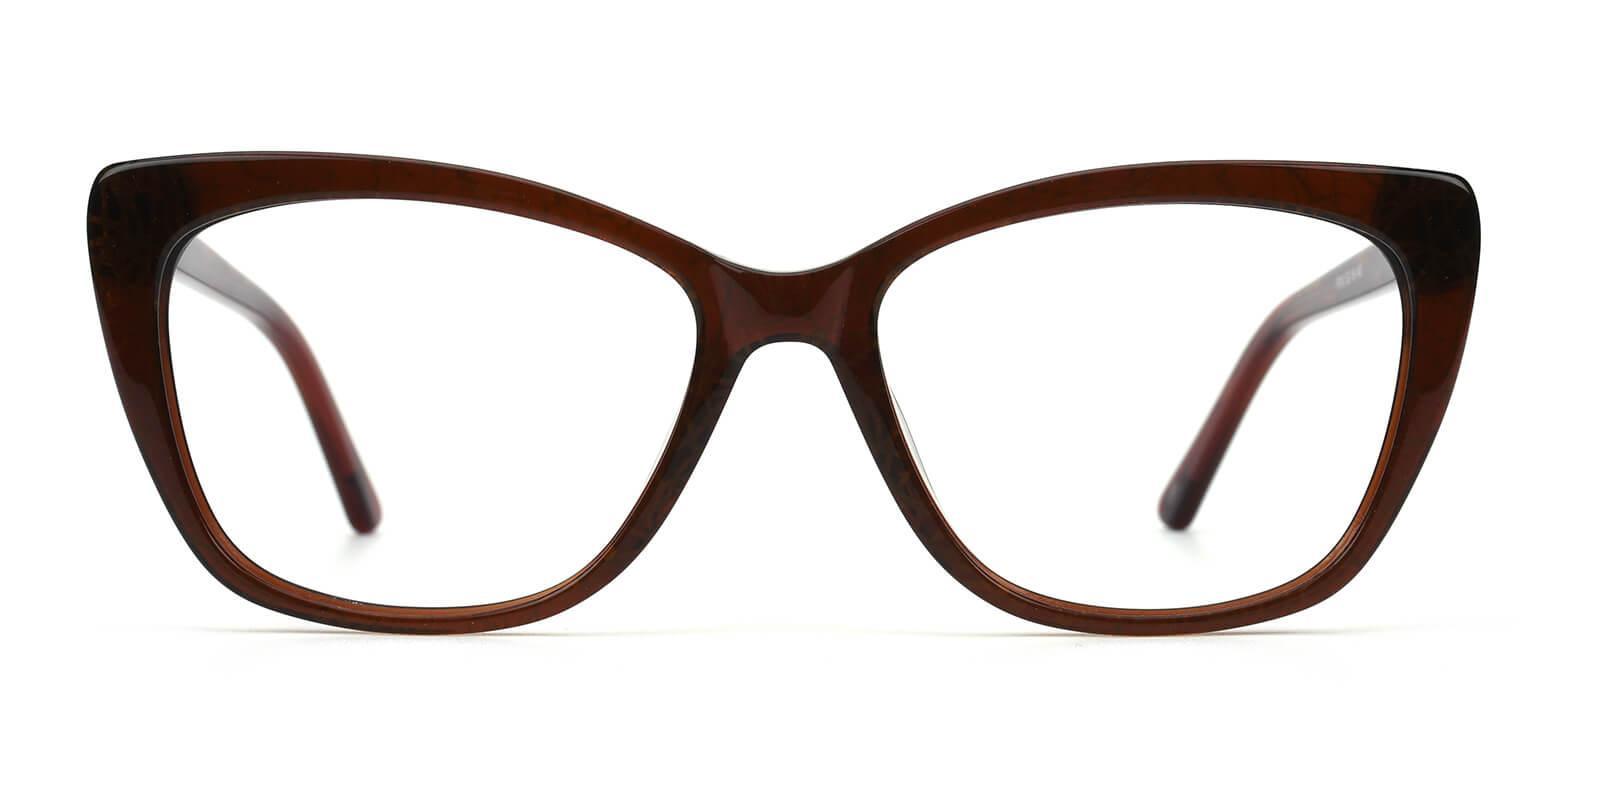 Kiko-Leopard-Cat-Acetate-Eyeglasses-detail